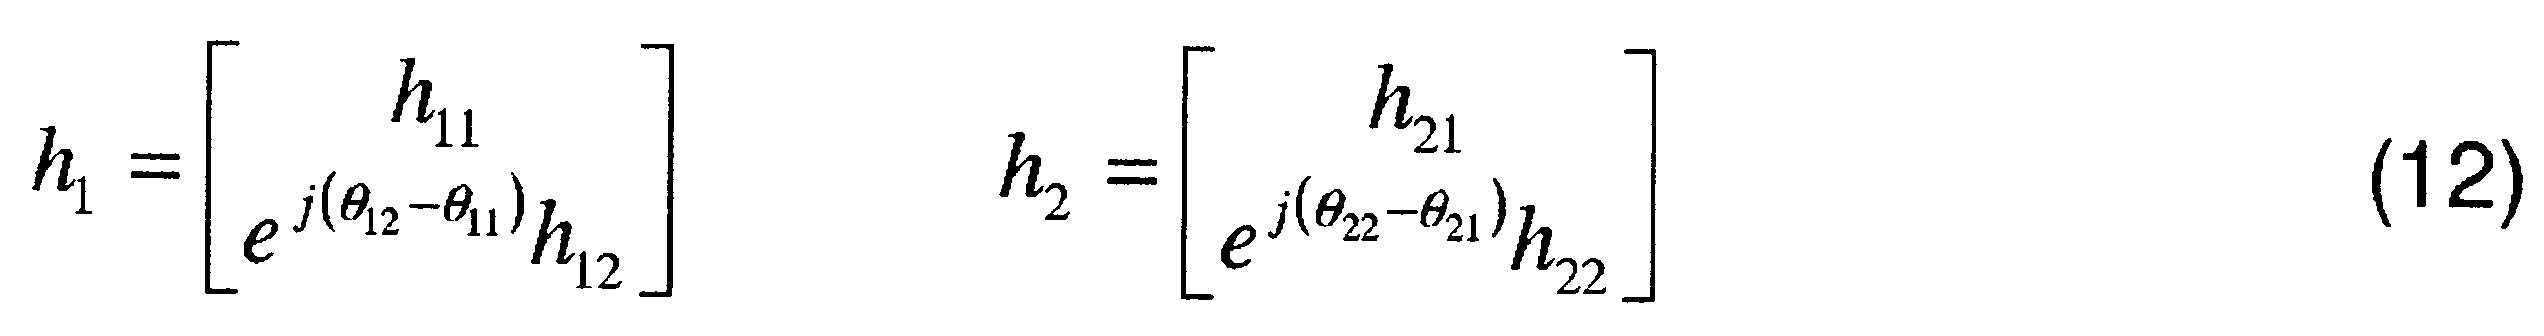 Figure 112015010005017-pat00078